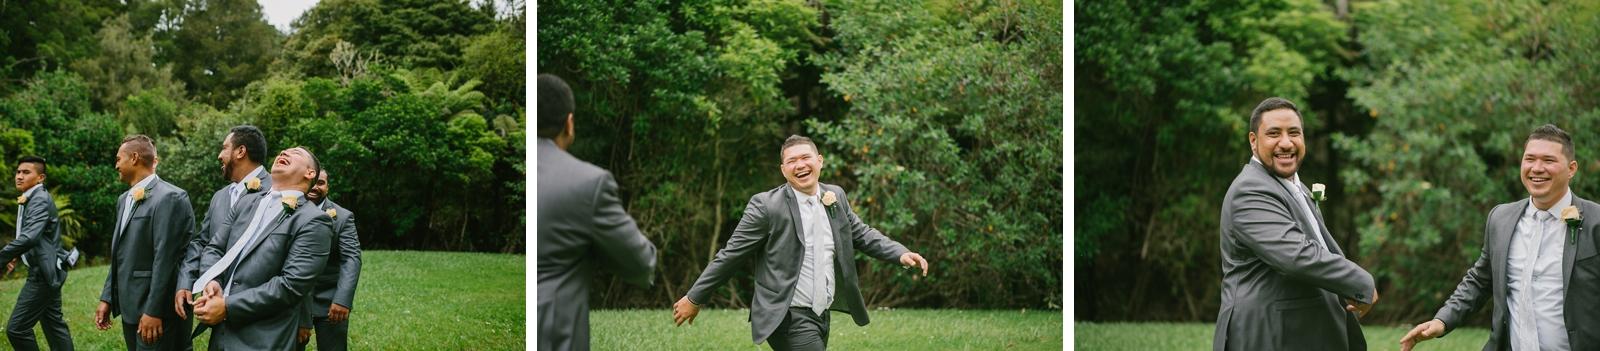 GabbyFiti_Auckland Wedding Photographer_Patty Lagera_0047.jpg